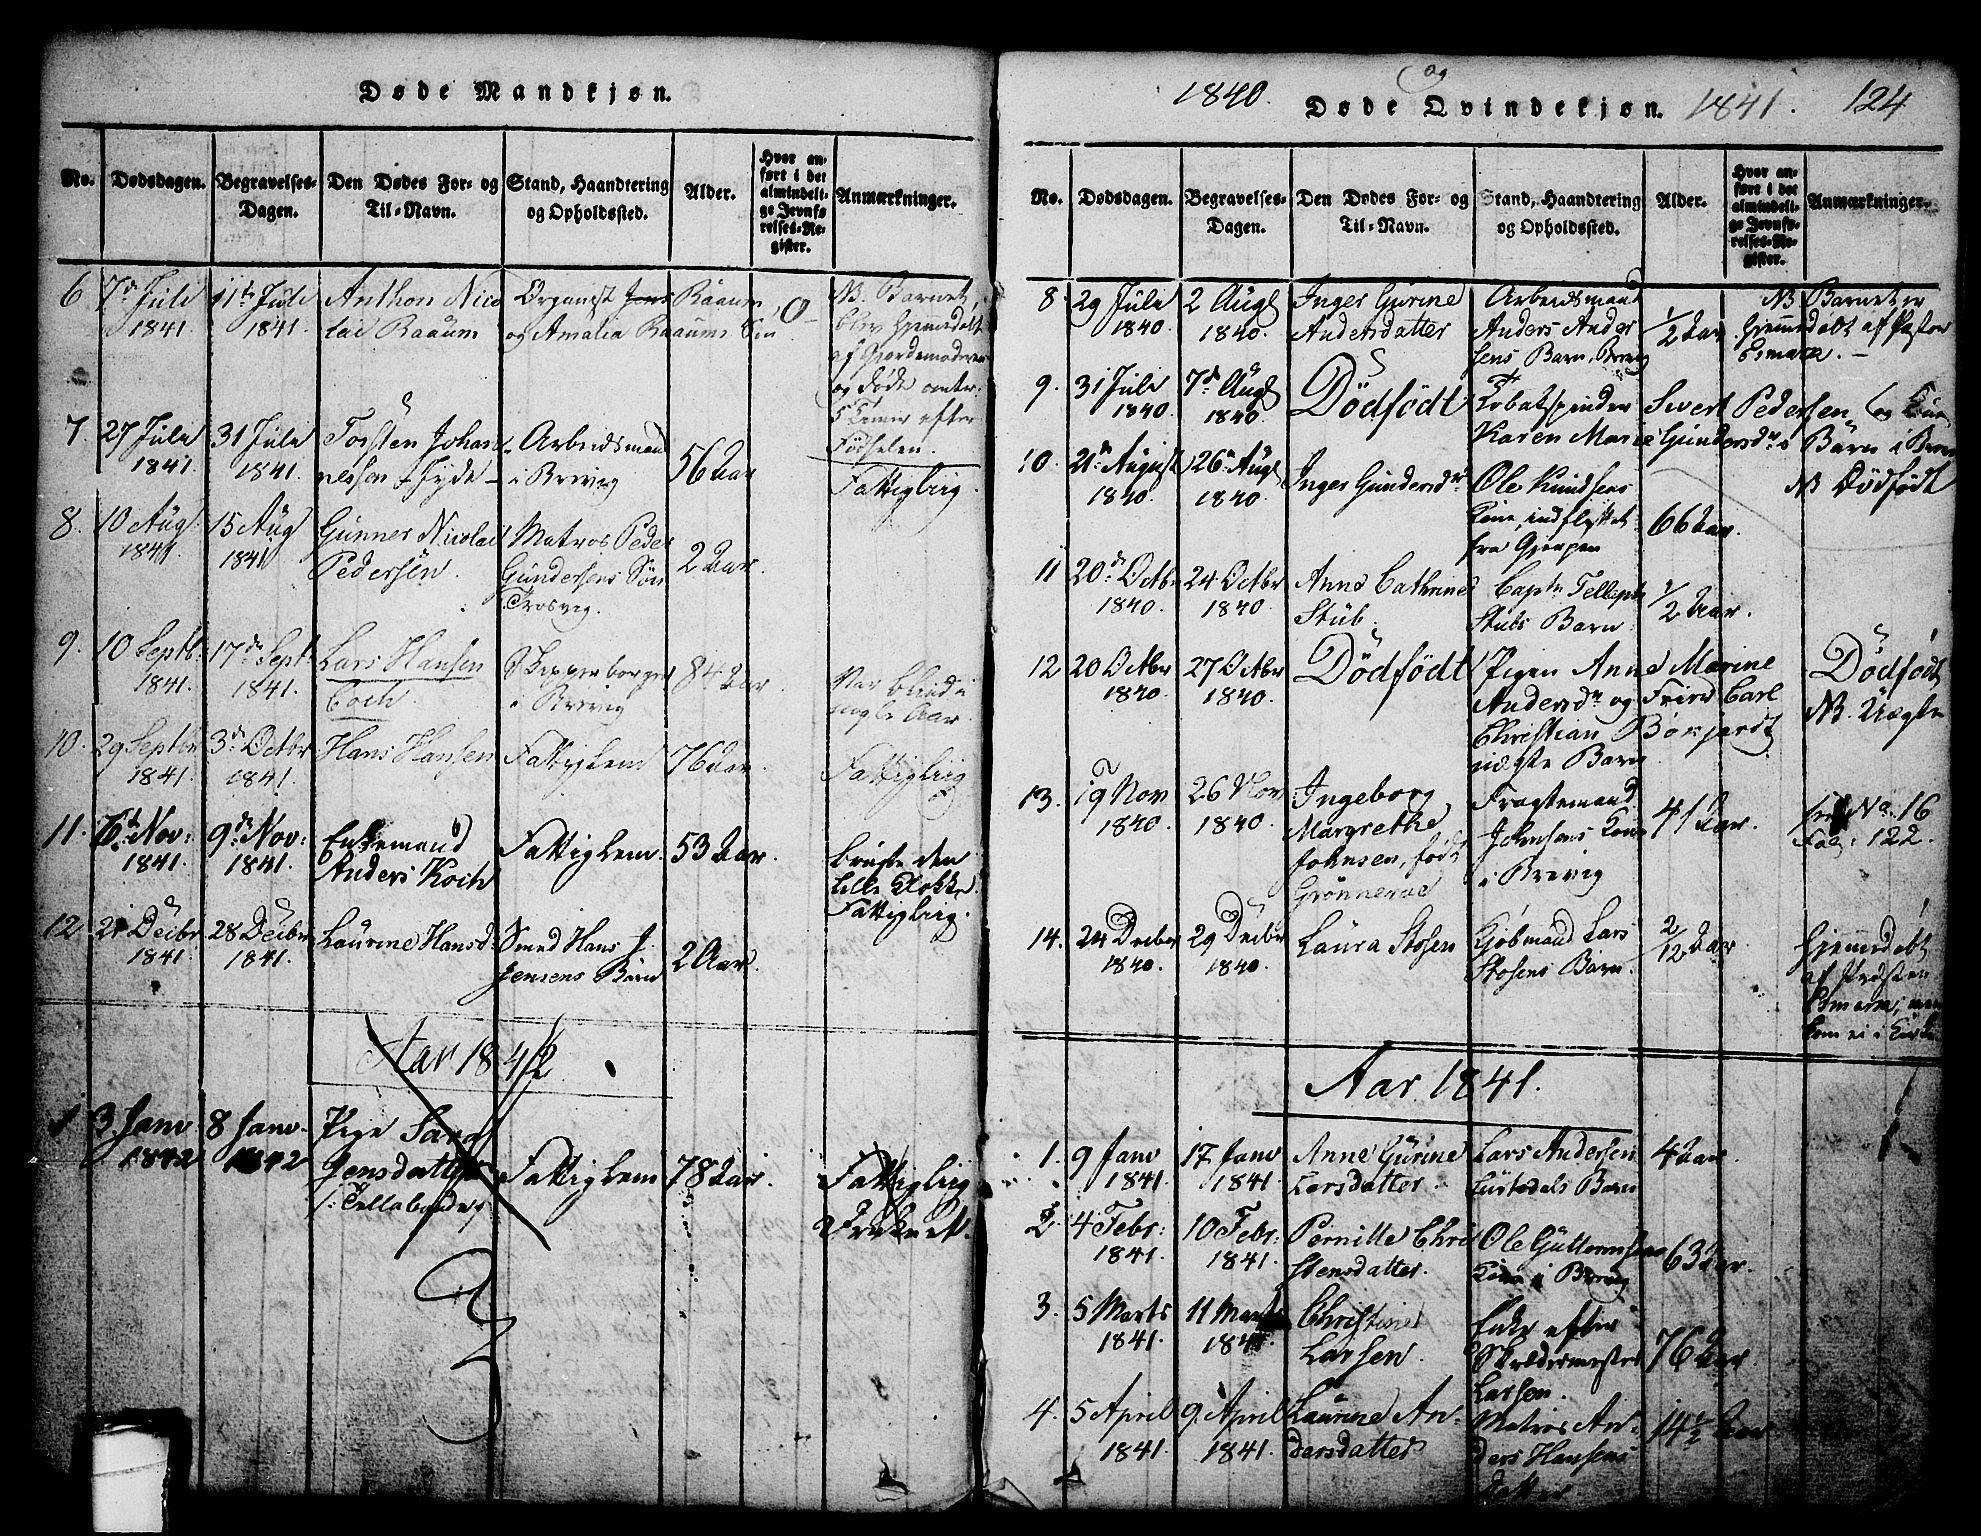 SAKO, Brevik kirkebøker, G/Ga/L0001: Klokkerbok nr. 1, 1814-1845, s. 124